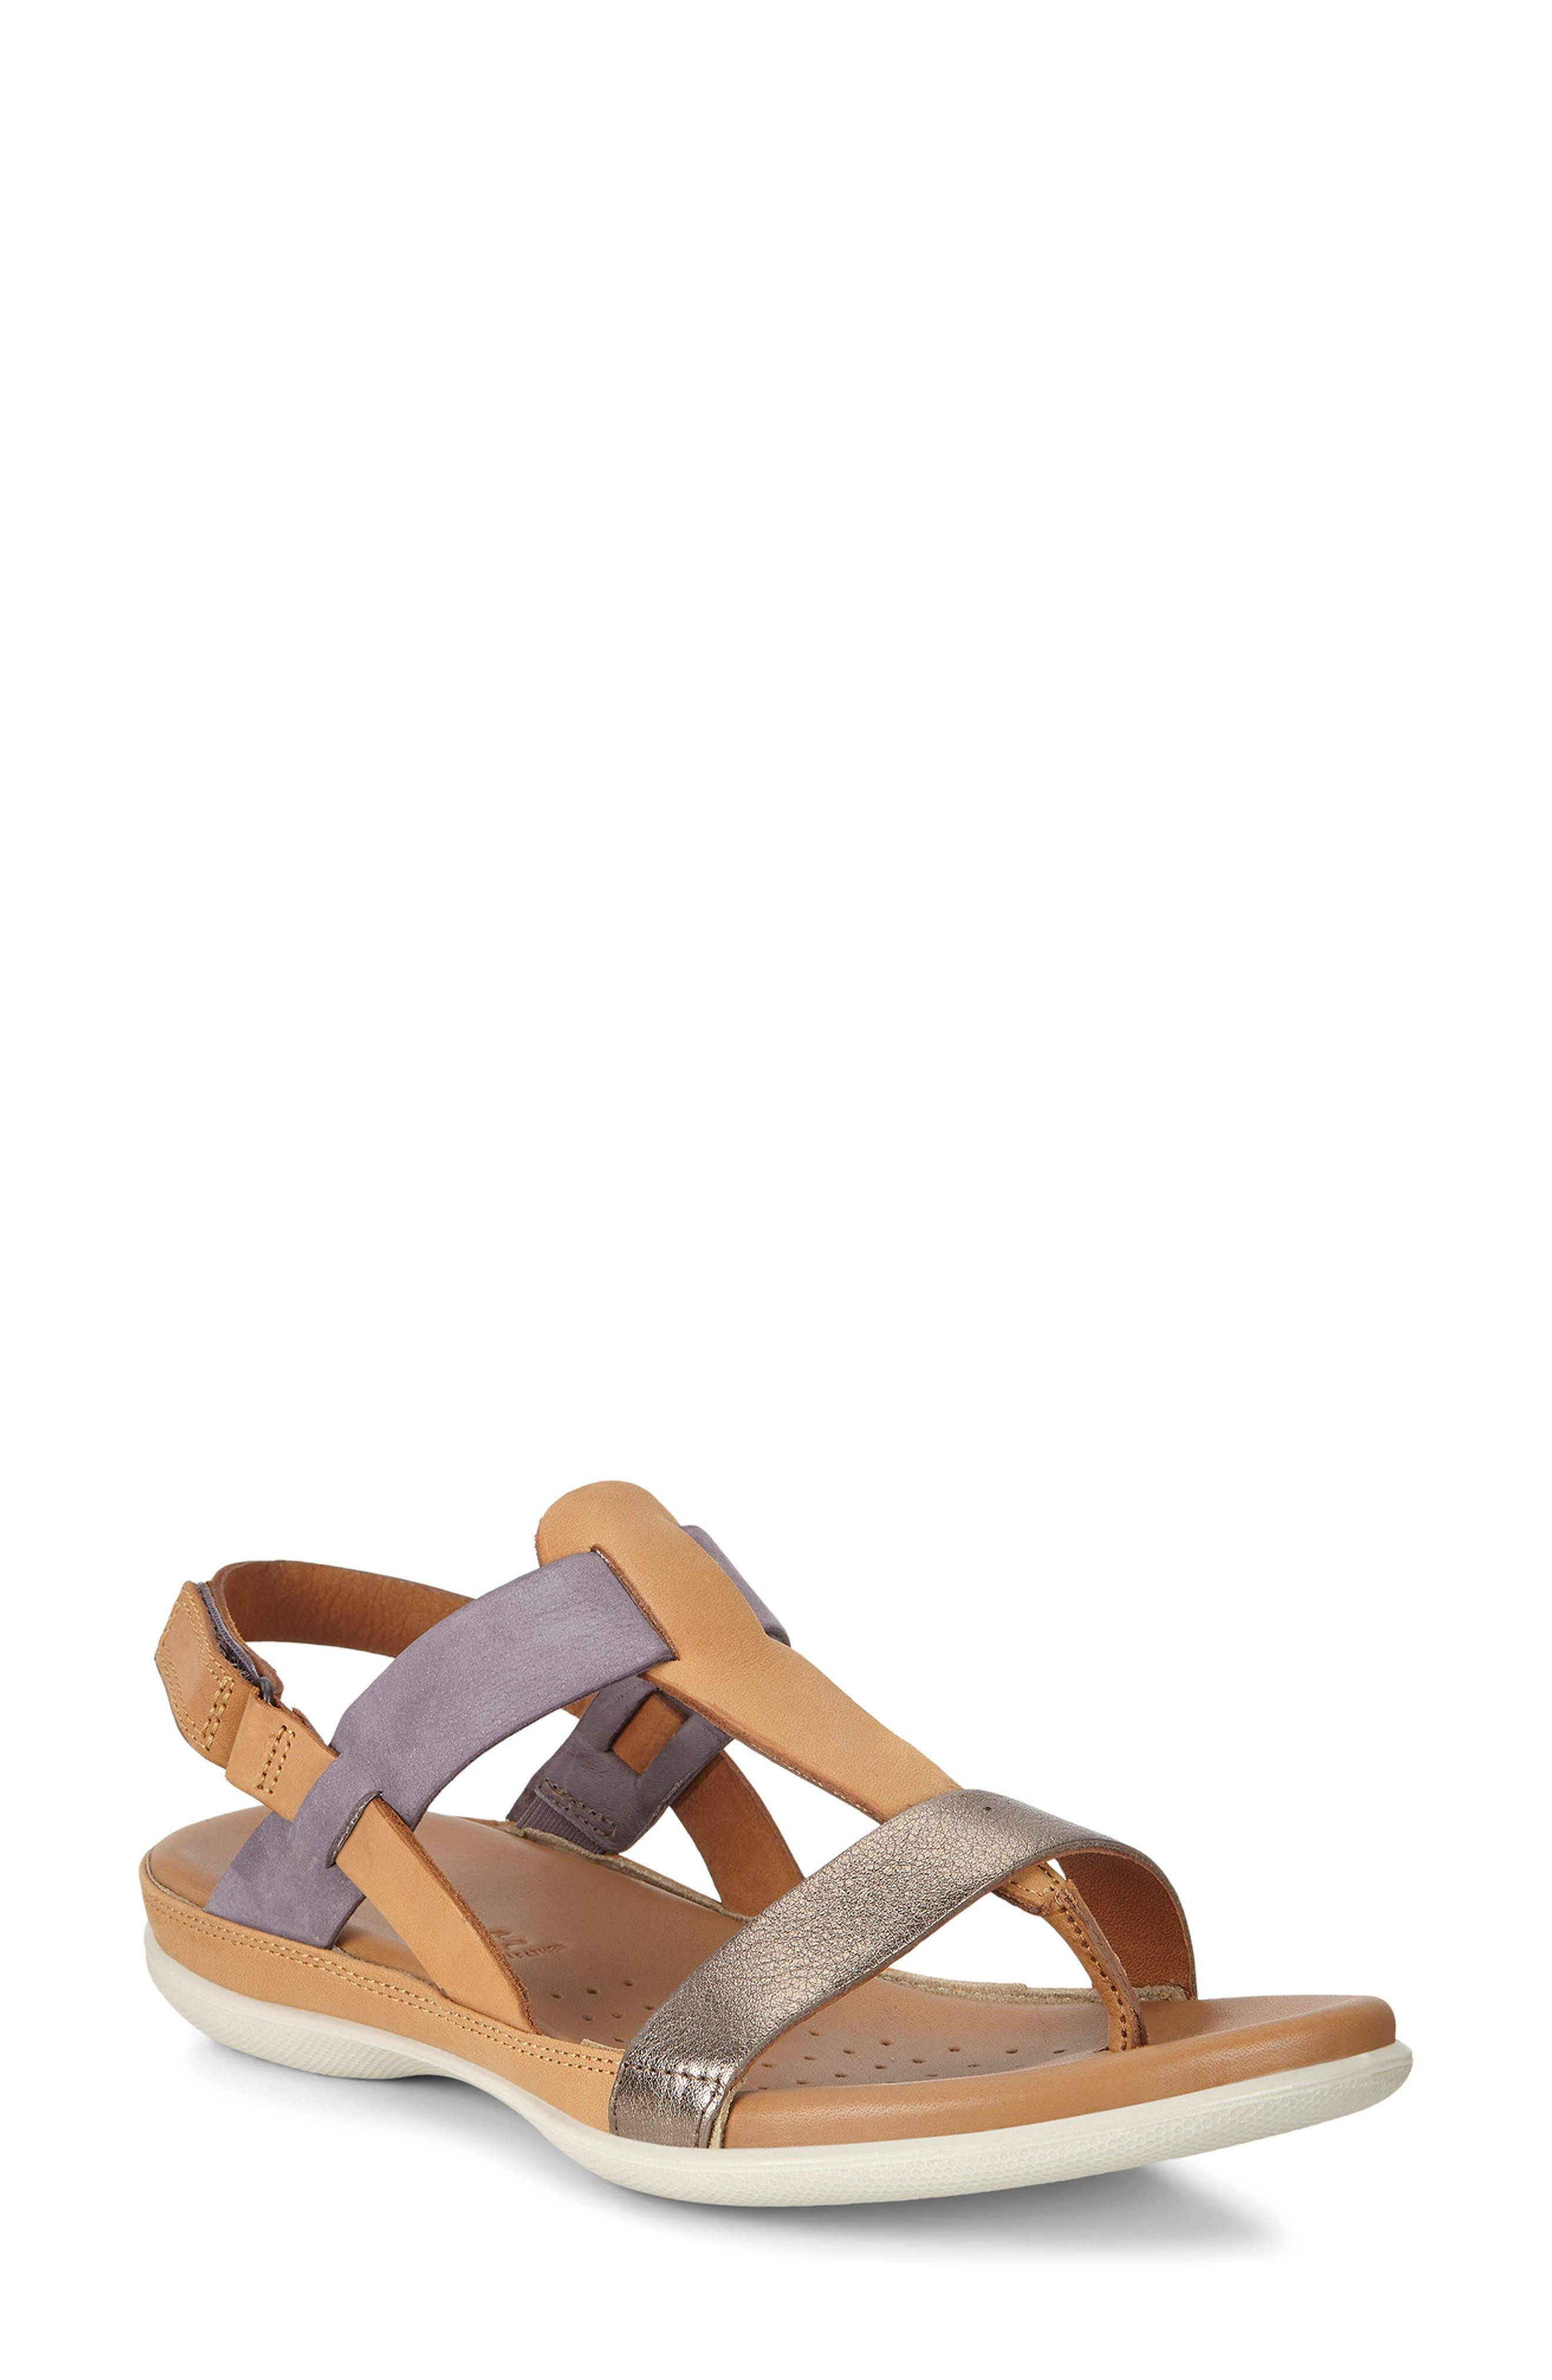 ECCO Women's Ecco Flash Toe Post Sandal, Size 6-6.5US - Beige